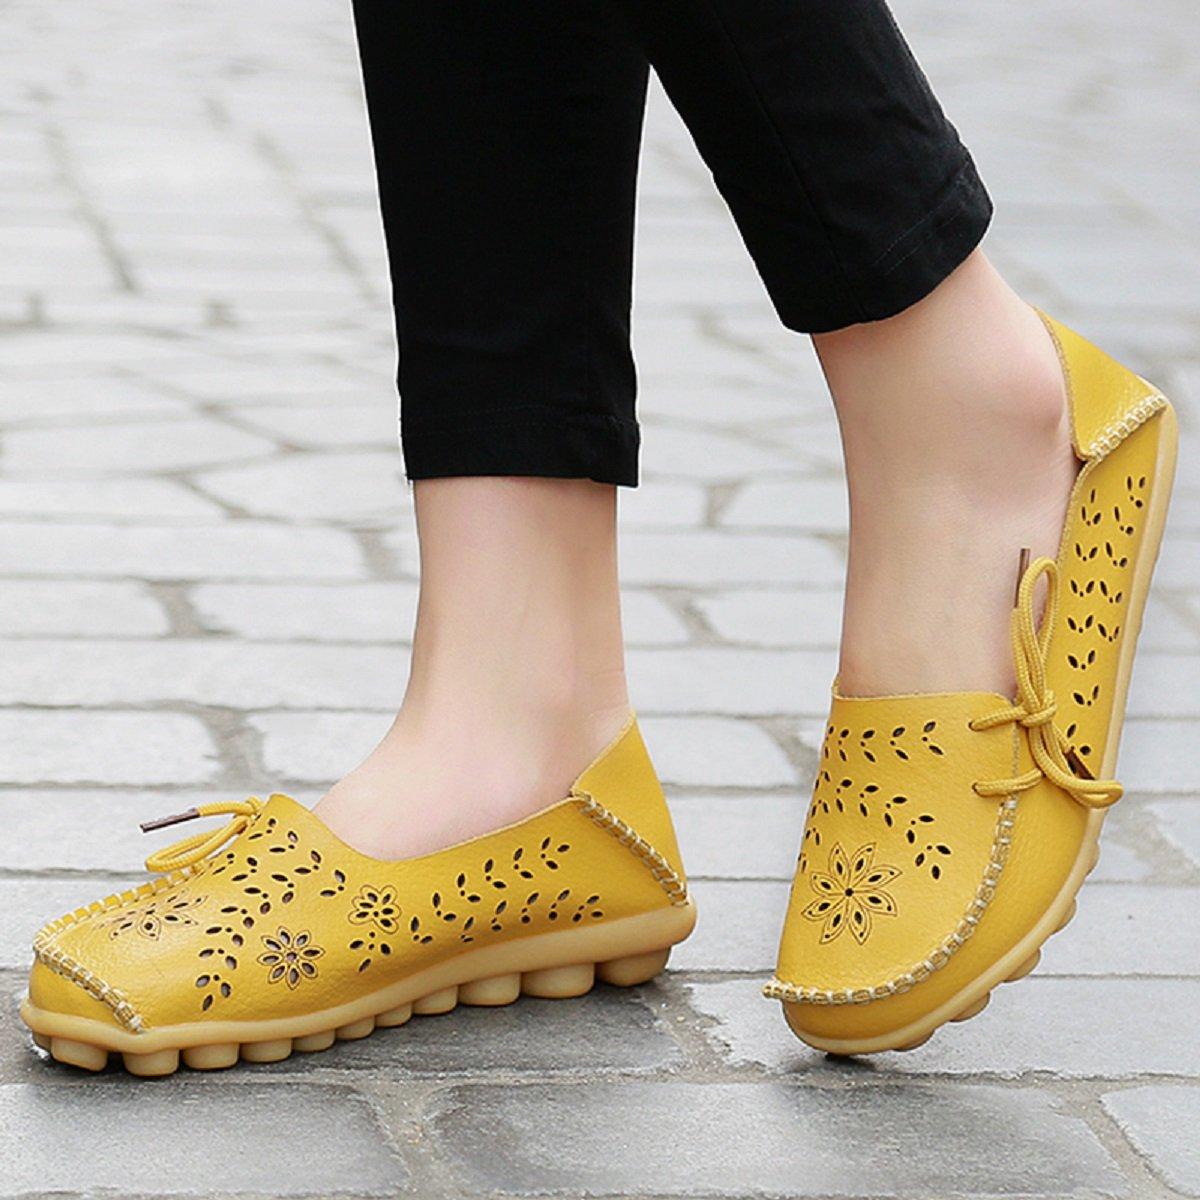 Gogoxm Mocassins Lofers Chaussures Femme Cuir Casuel Confort Slip on Espadrilles Conduite Respirant Casual 34-44